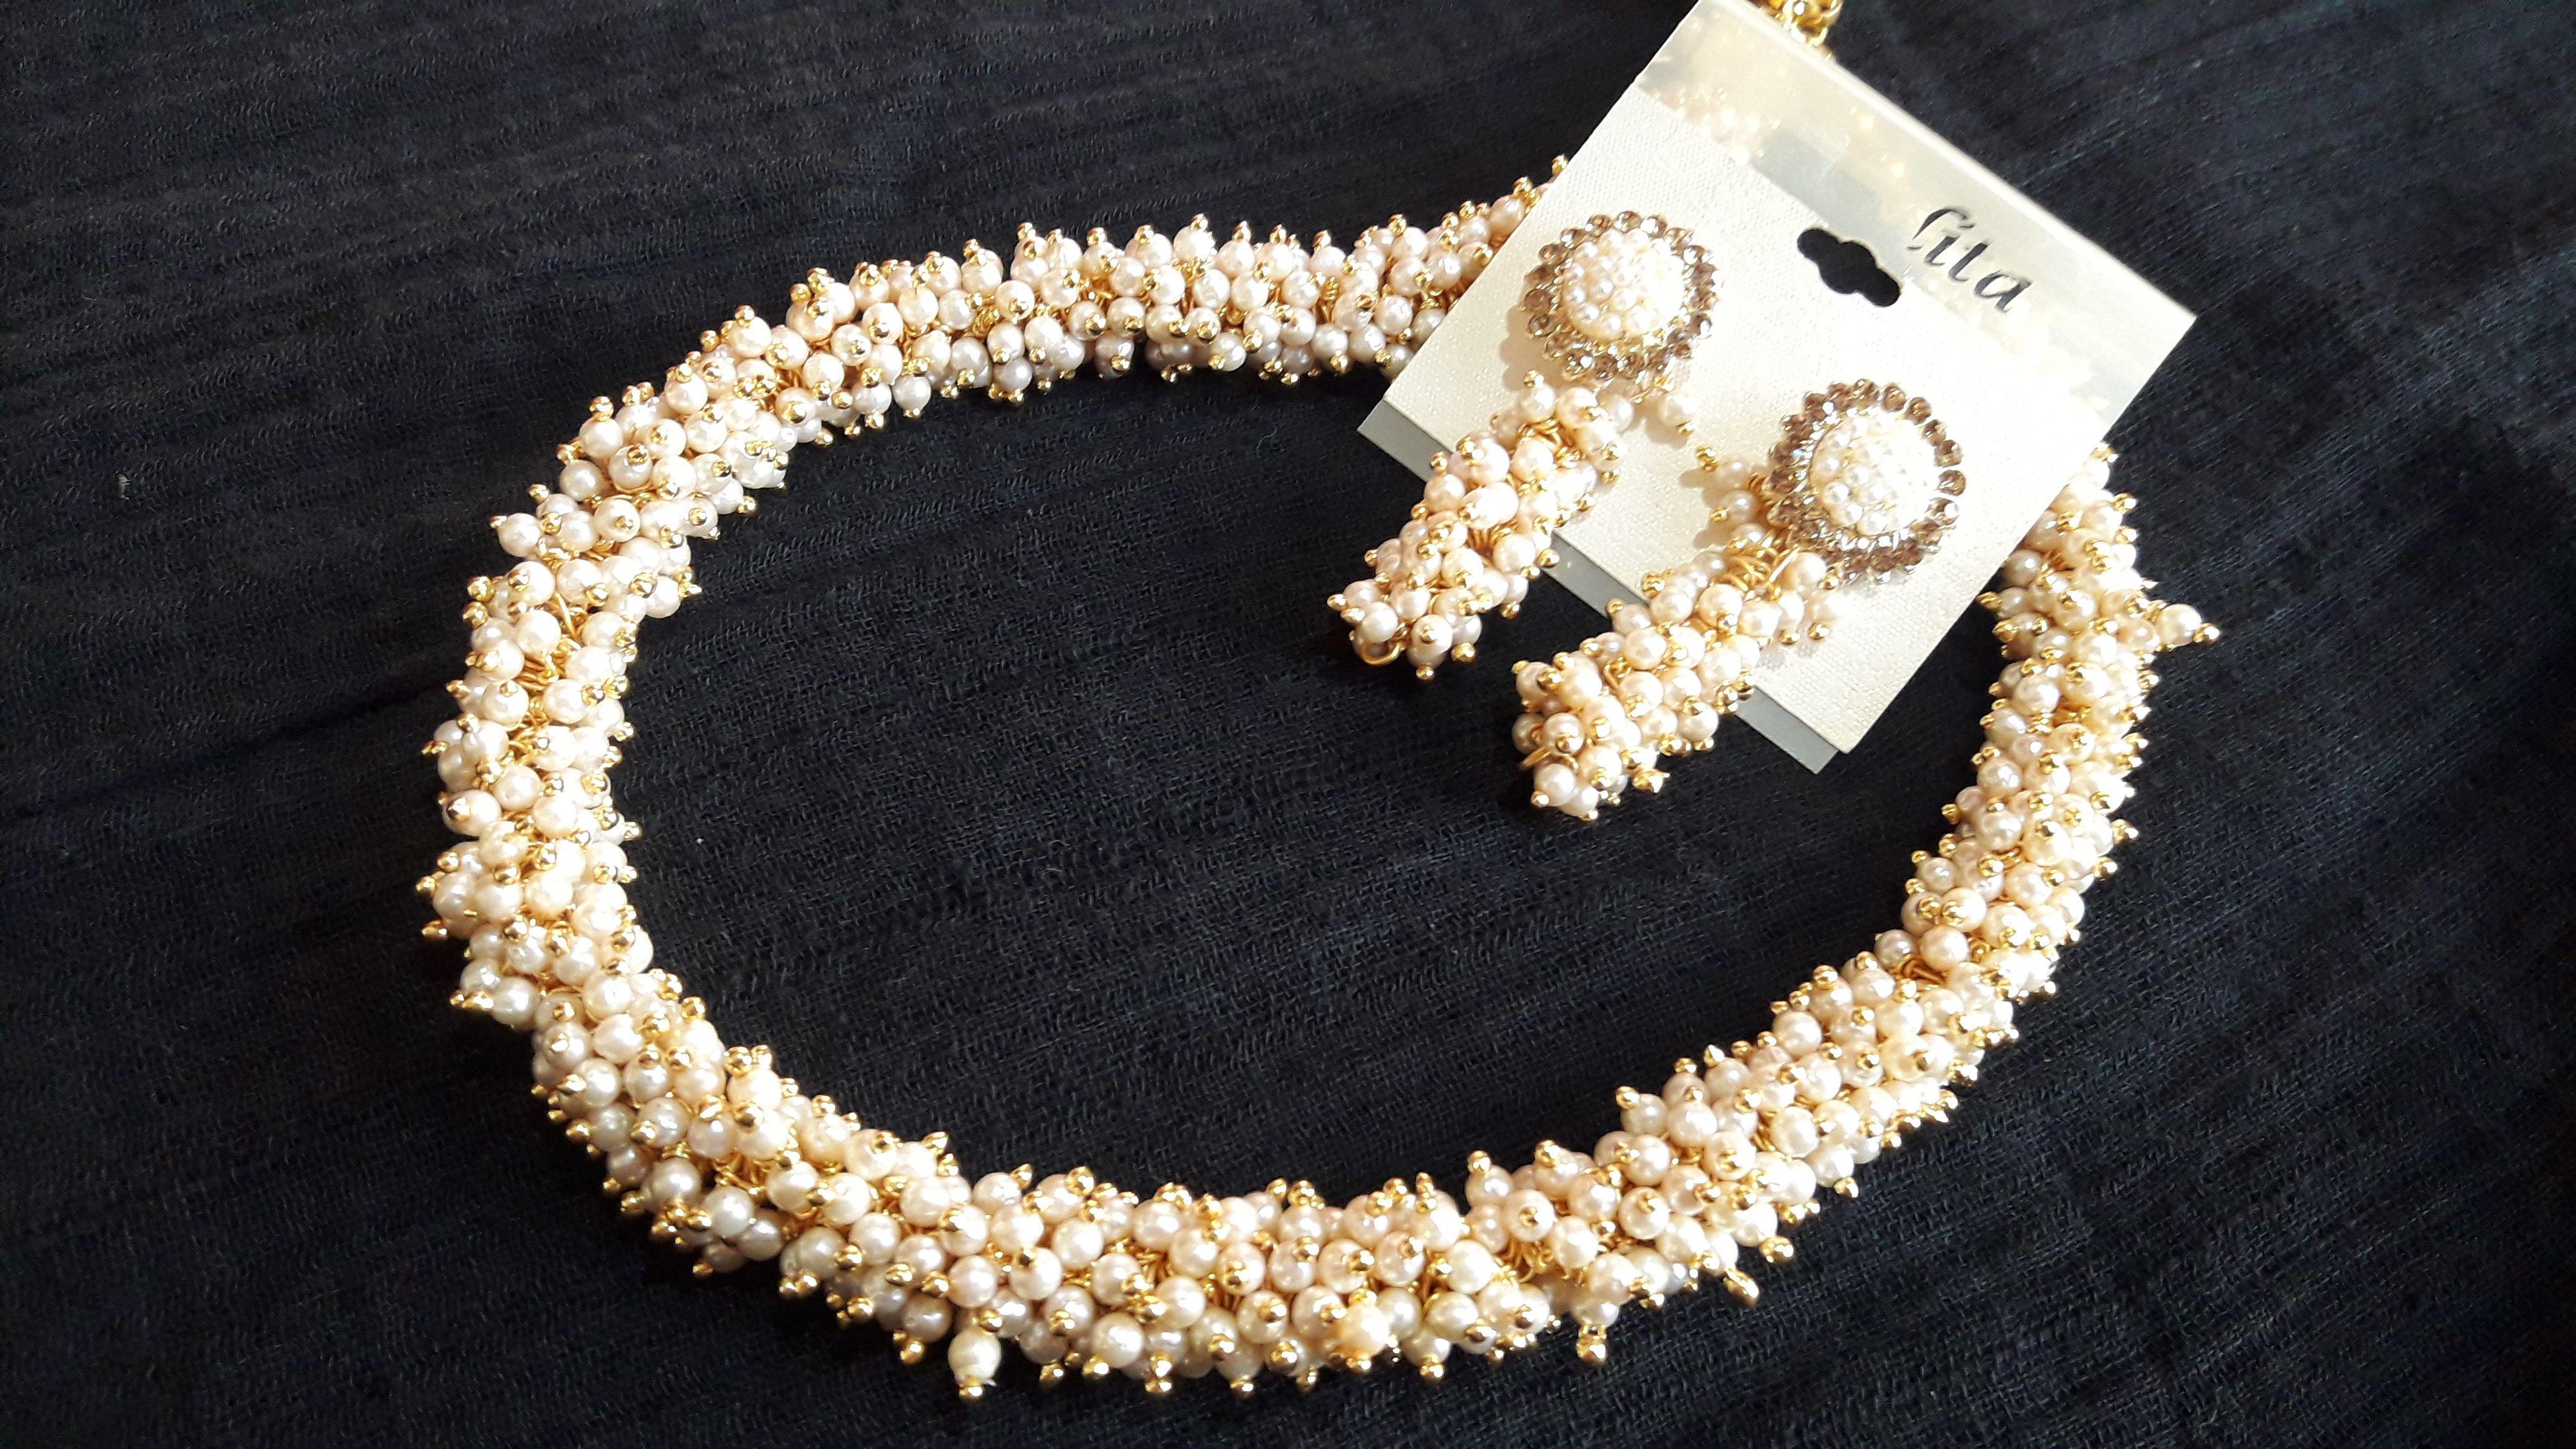 f654e81cbb #Prasadsilkthreadjewellery - #White #loreal #necklace #jewellery Thread  Jewellery, Silk Thread